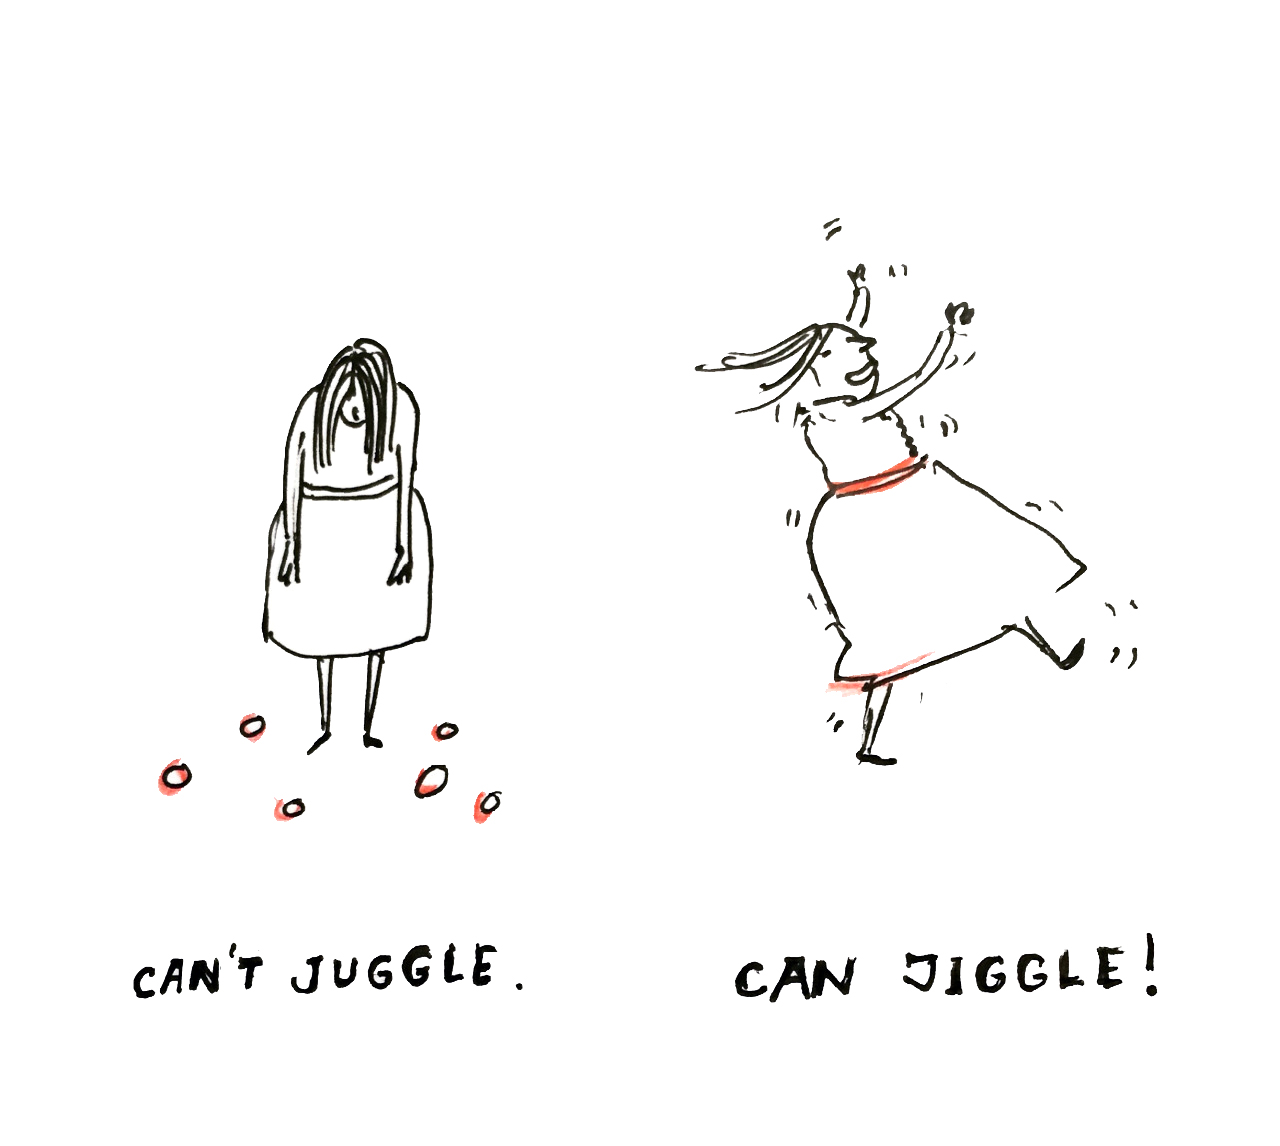 bw-juggle.jpg